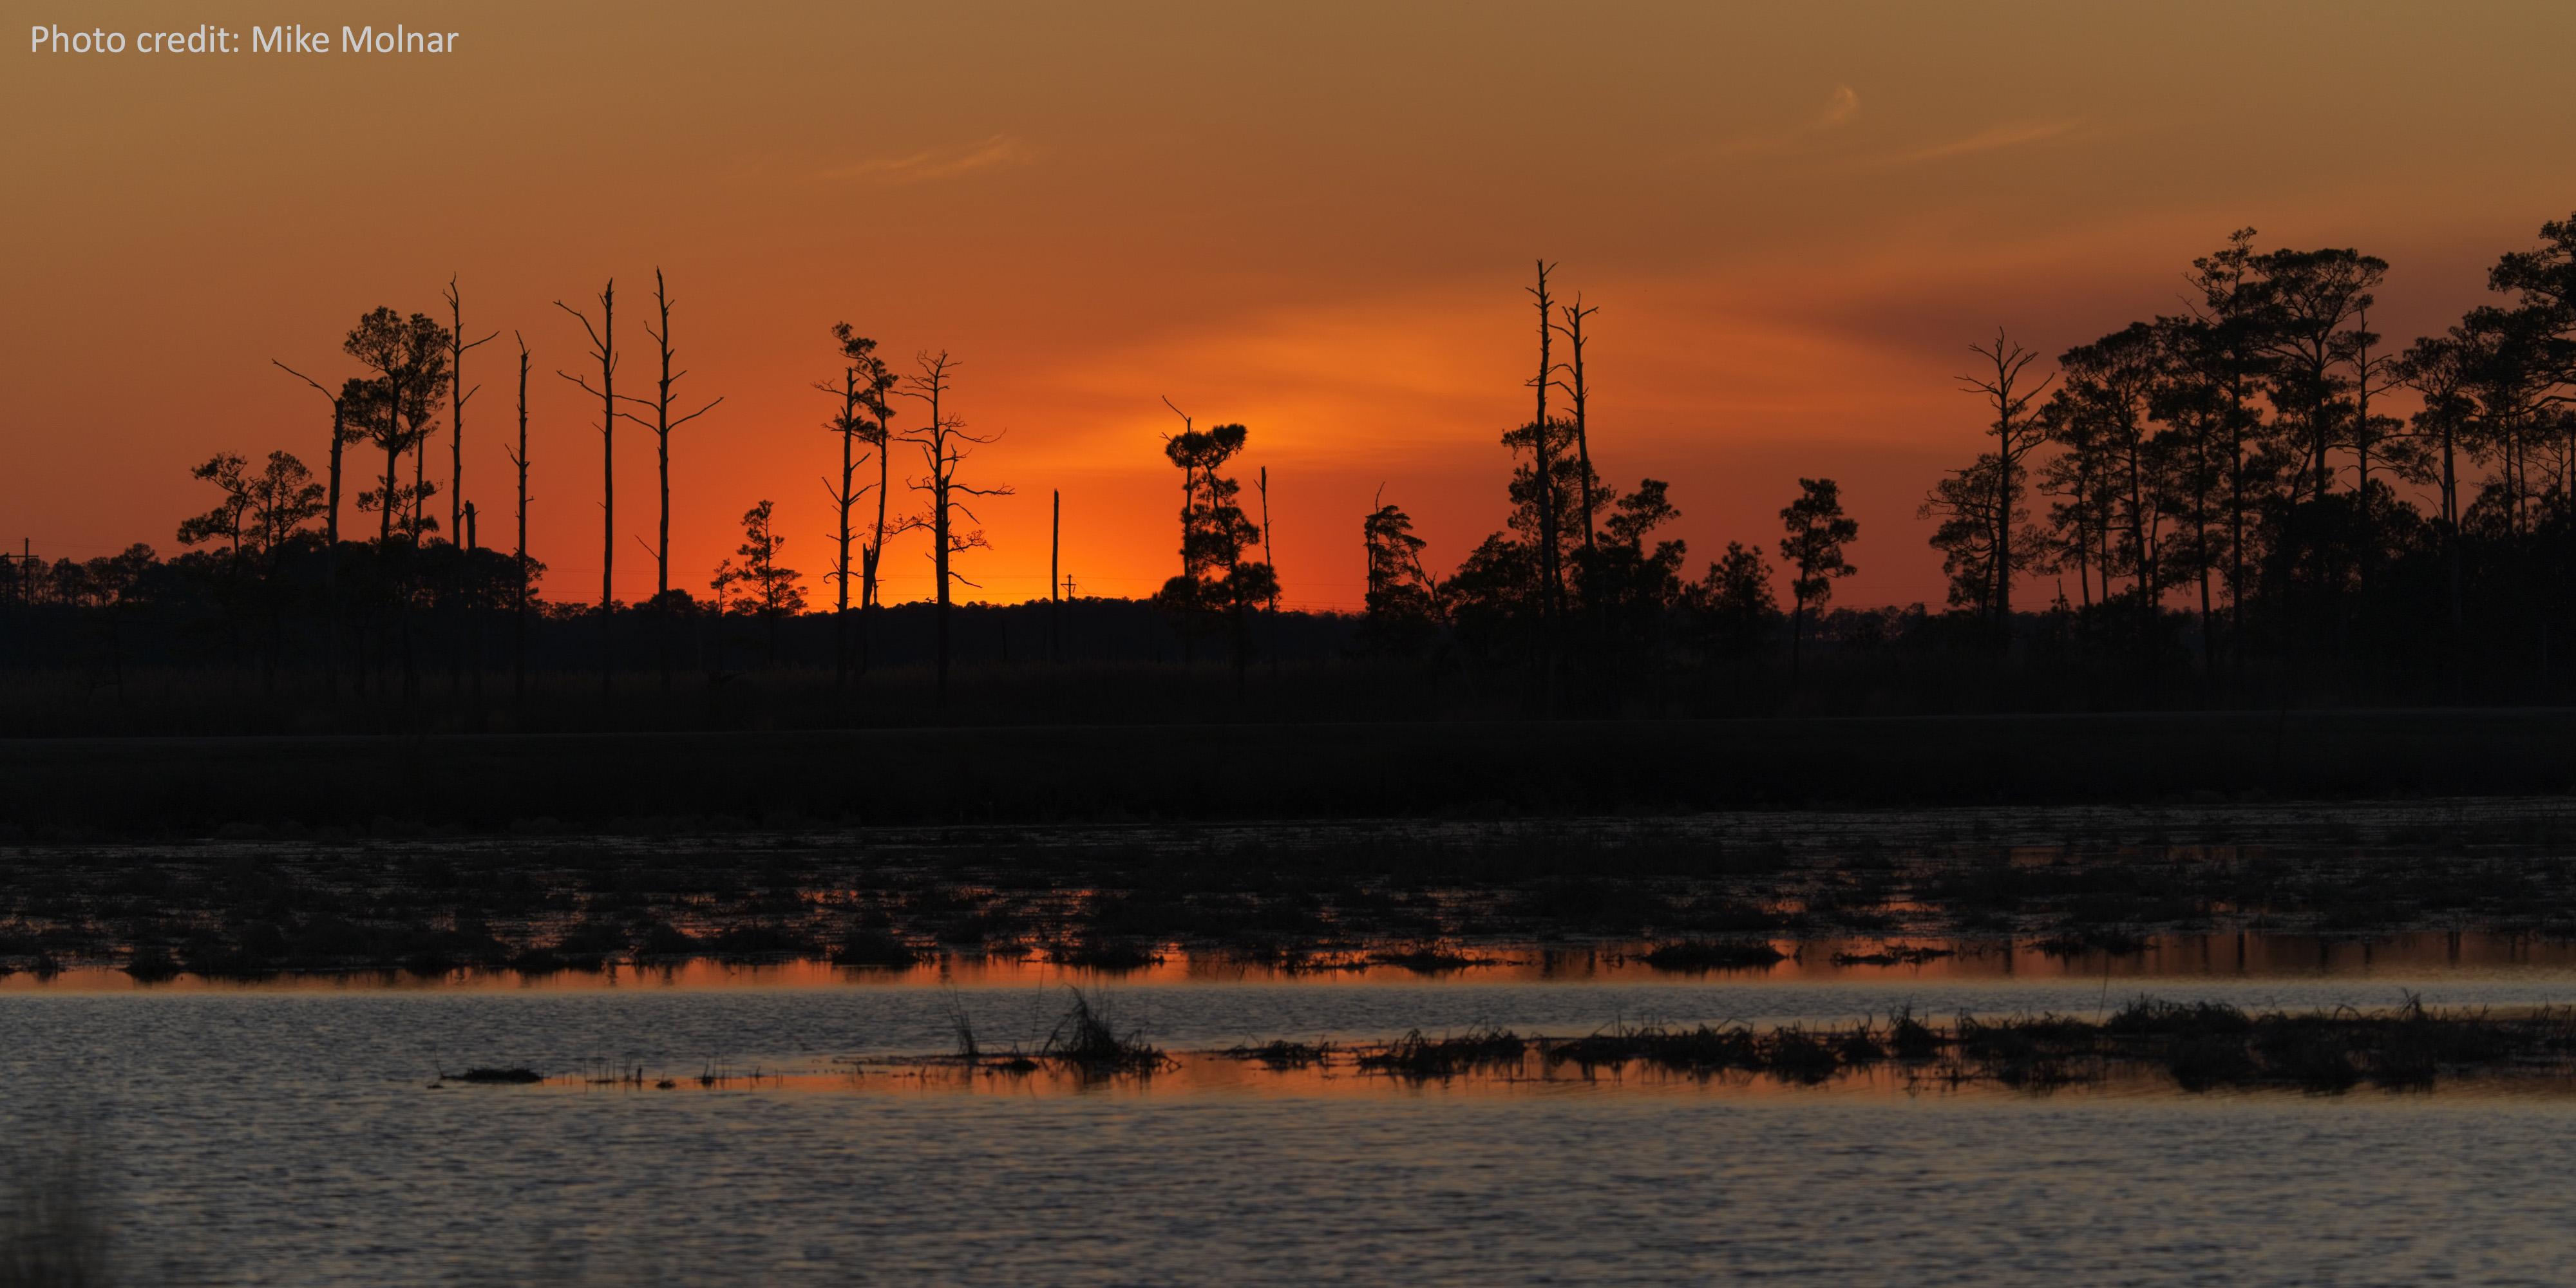 Sunset over Blackwater National Wildlife Refuge